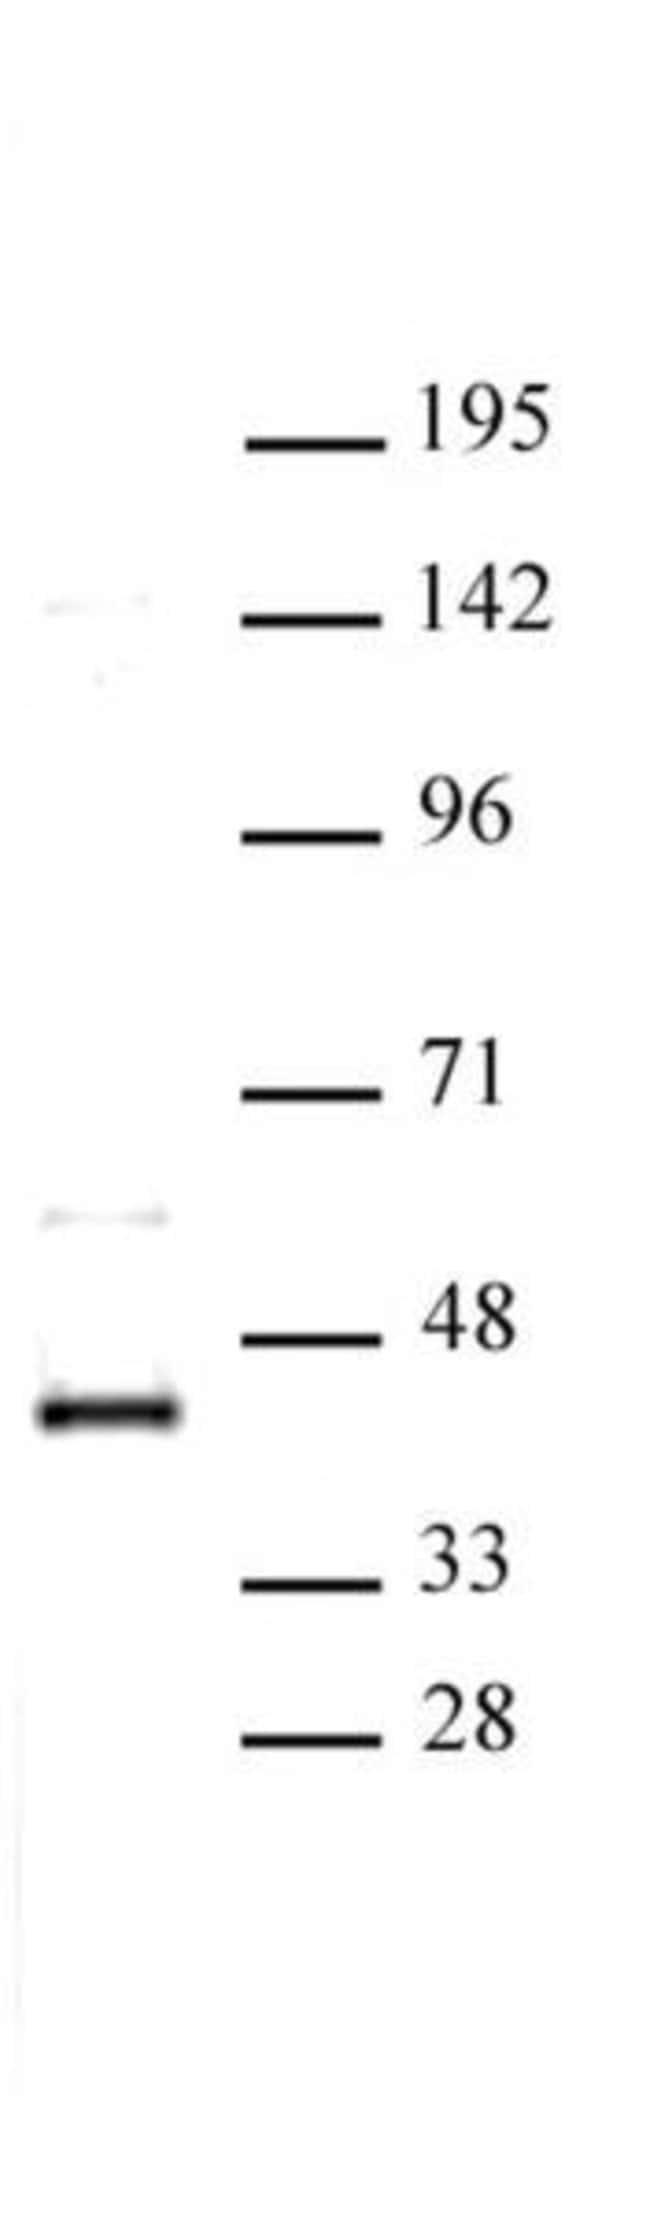 CDK9 Rabbit anti-Human, Unconjugated, Polyclonal, Active Motif:Antibodies:Primary